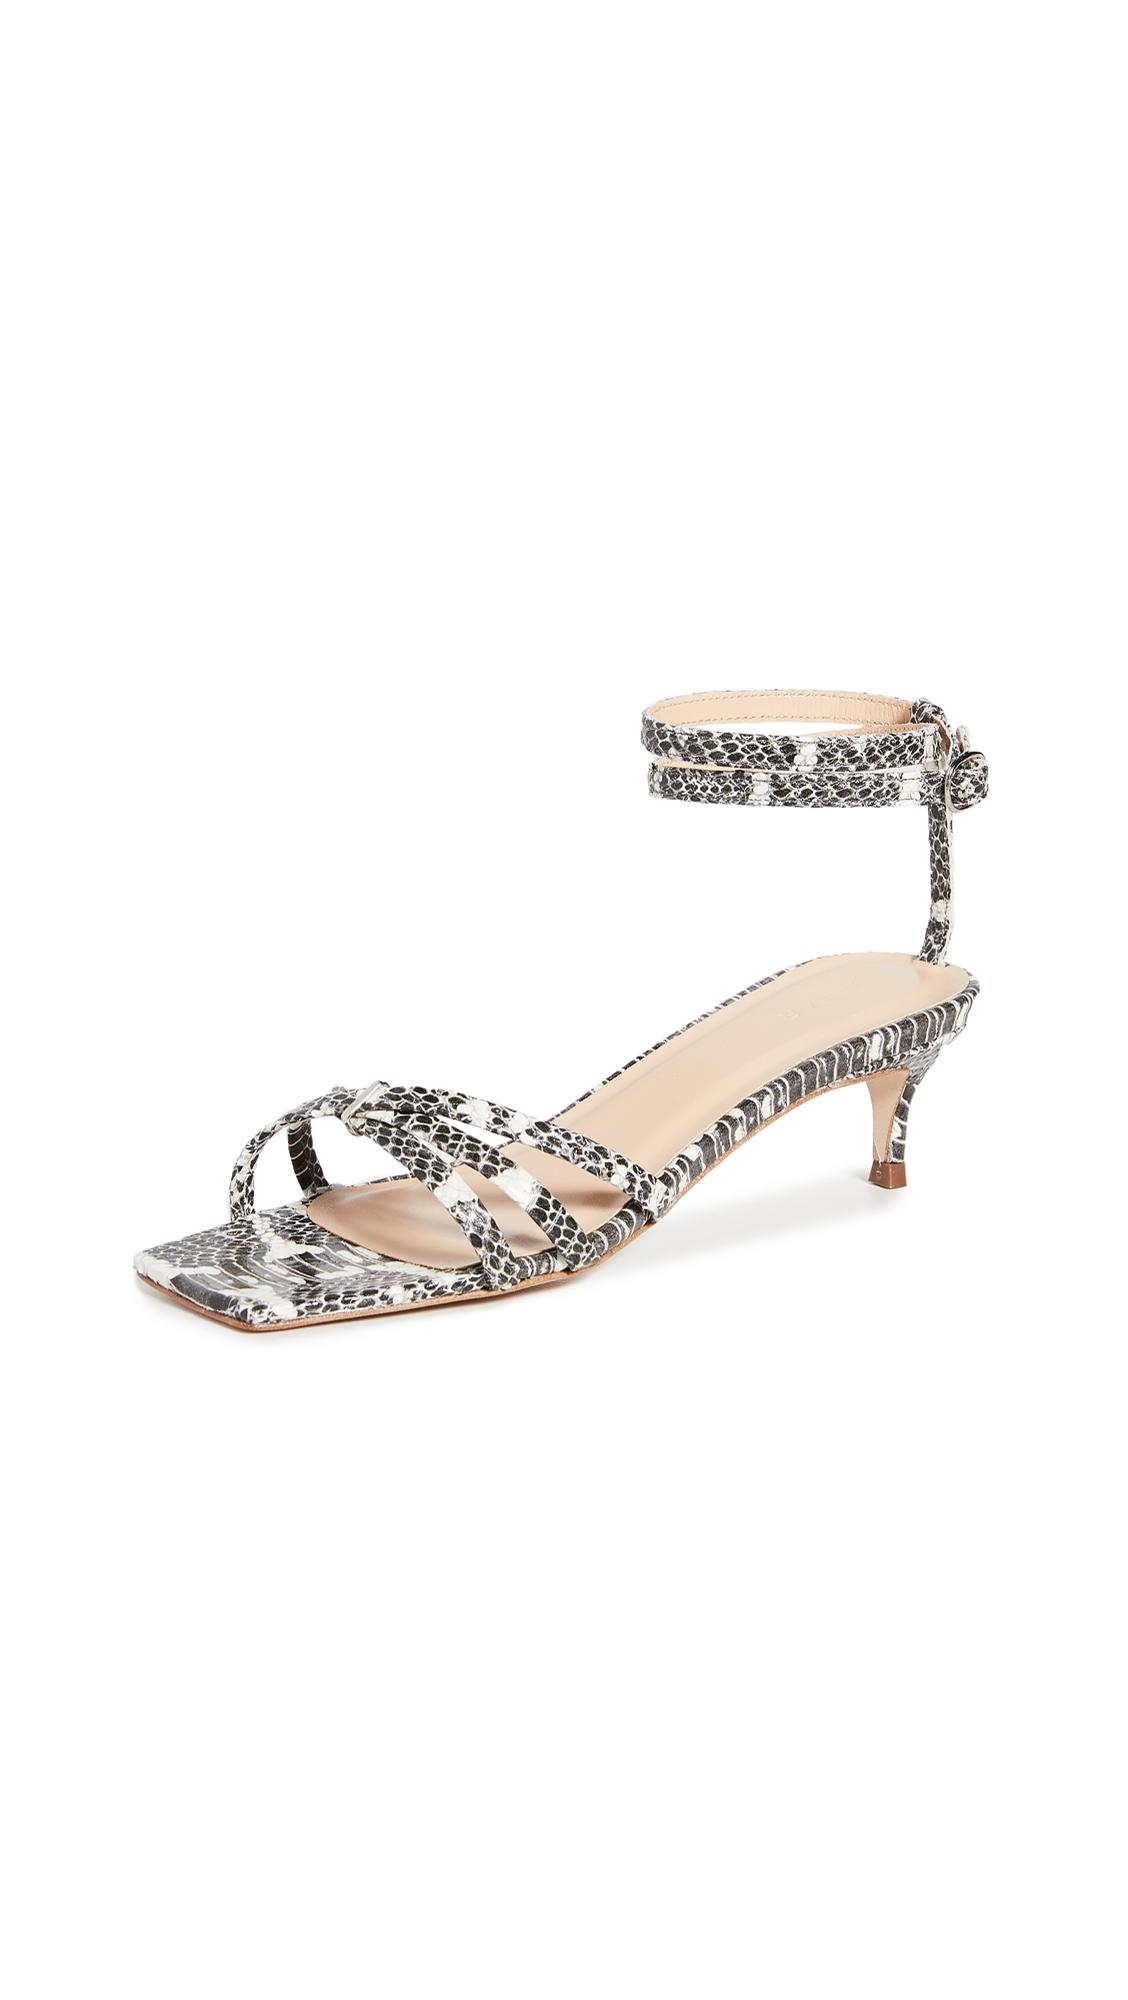 Buy BY FAR Kaia Sandals online, shop BY FAR